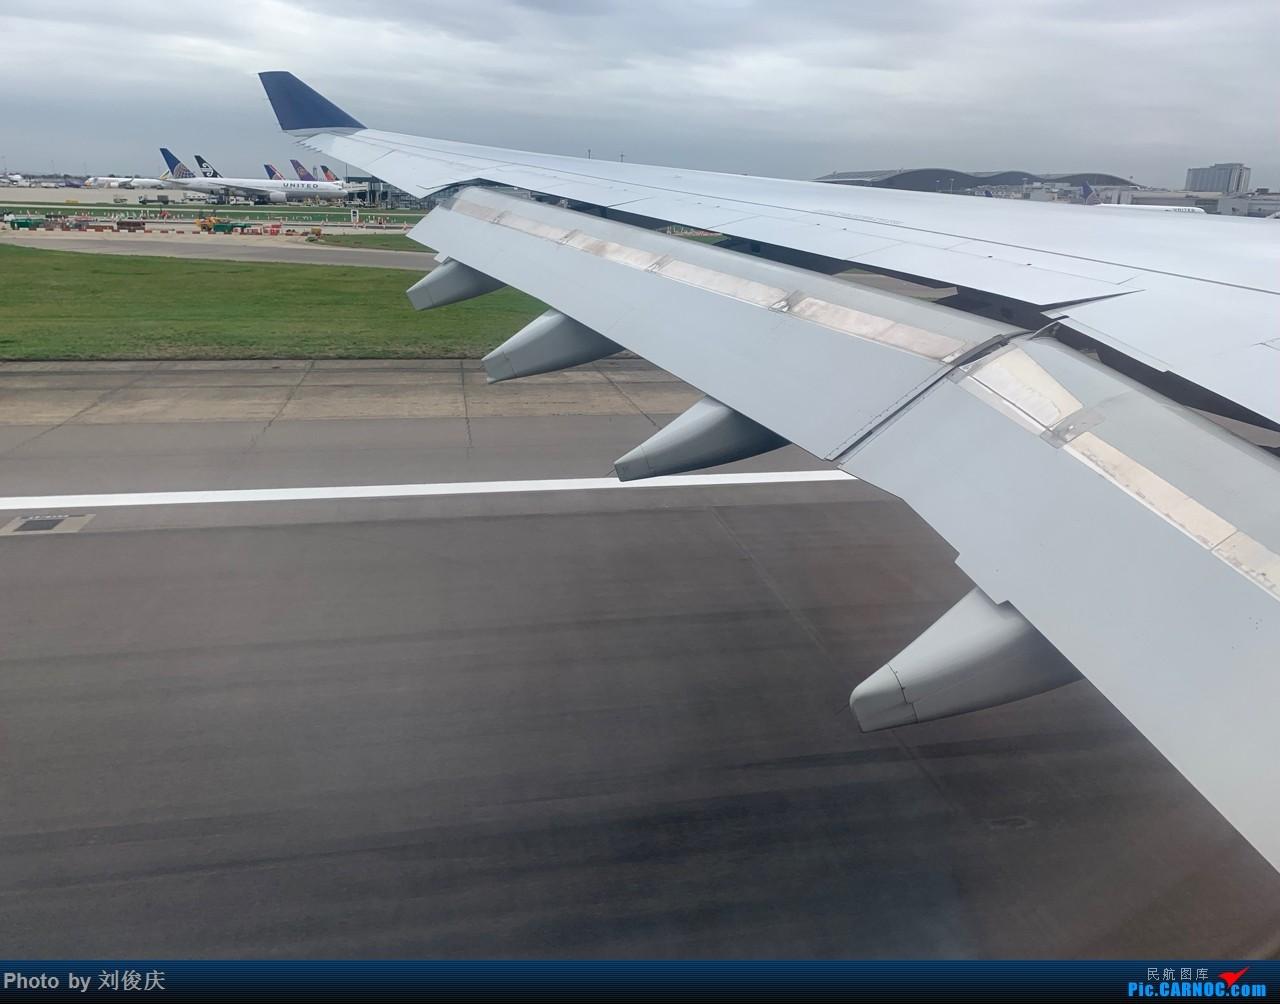 Re:[原创]SEA-JFK-LHR-CDG-FCO-CDG-LHR-ATL-SEA 8天3国5城暴走游记 [更新至JFK] AIRBUS 330-200  In the Air